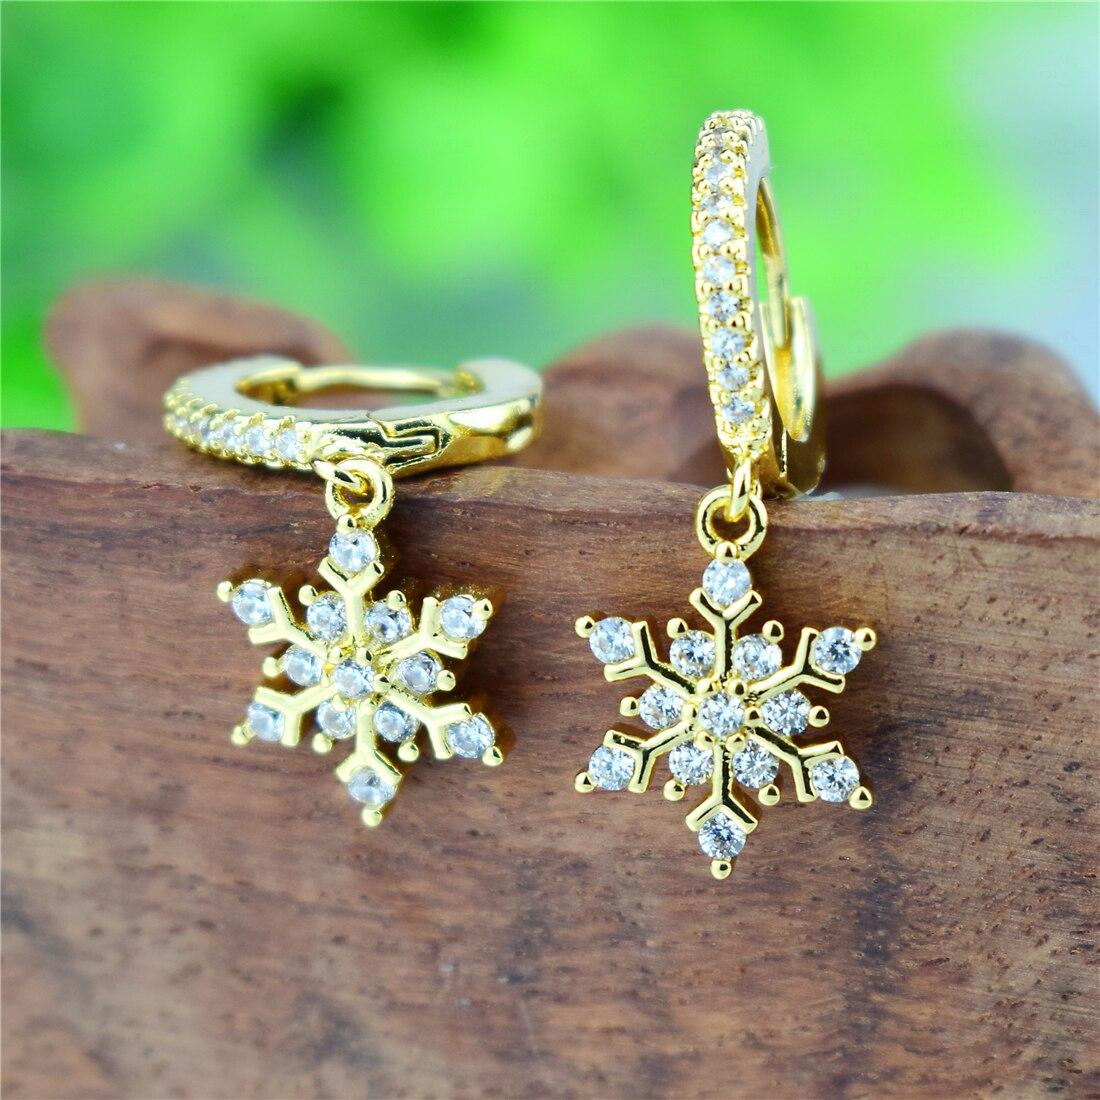 New AAA Zircon Golden Pendiente Flower Drop Earring Snow Flower Dangle Charms Women Luxury CZ Zircon Jewelry Gift